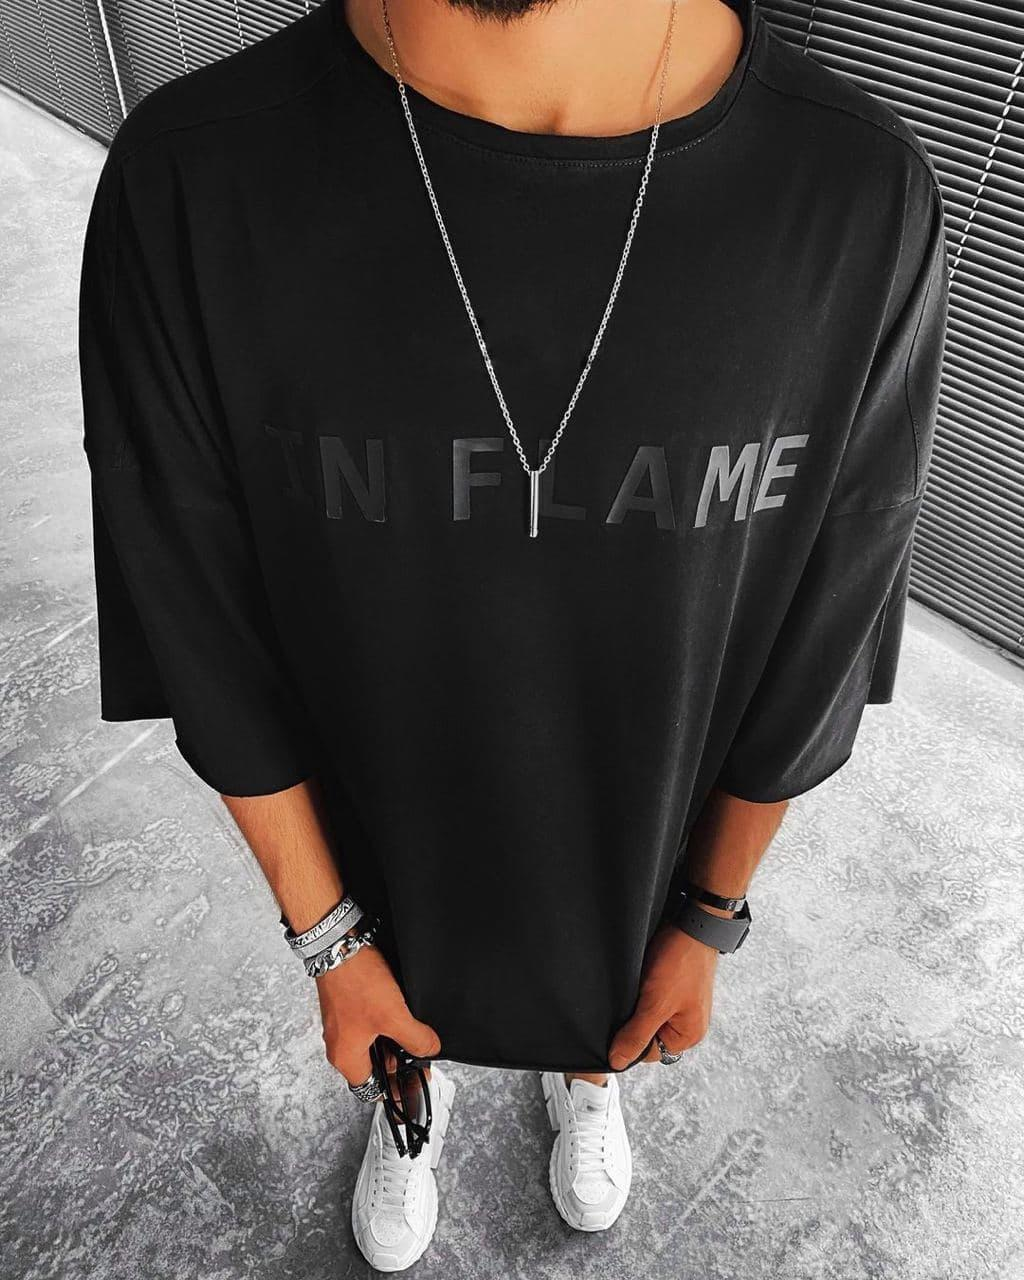 😜 Футболка - Мужская футболка оверсайз / футболка оверсайз чорна IN FLAME